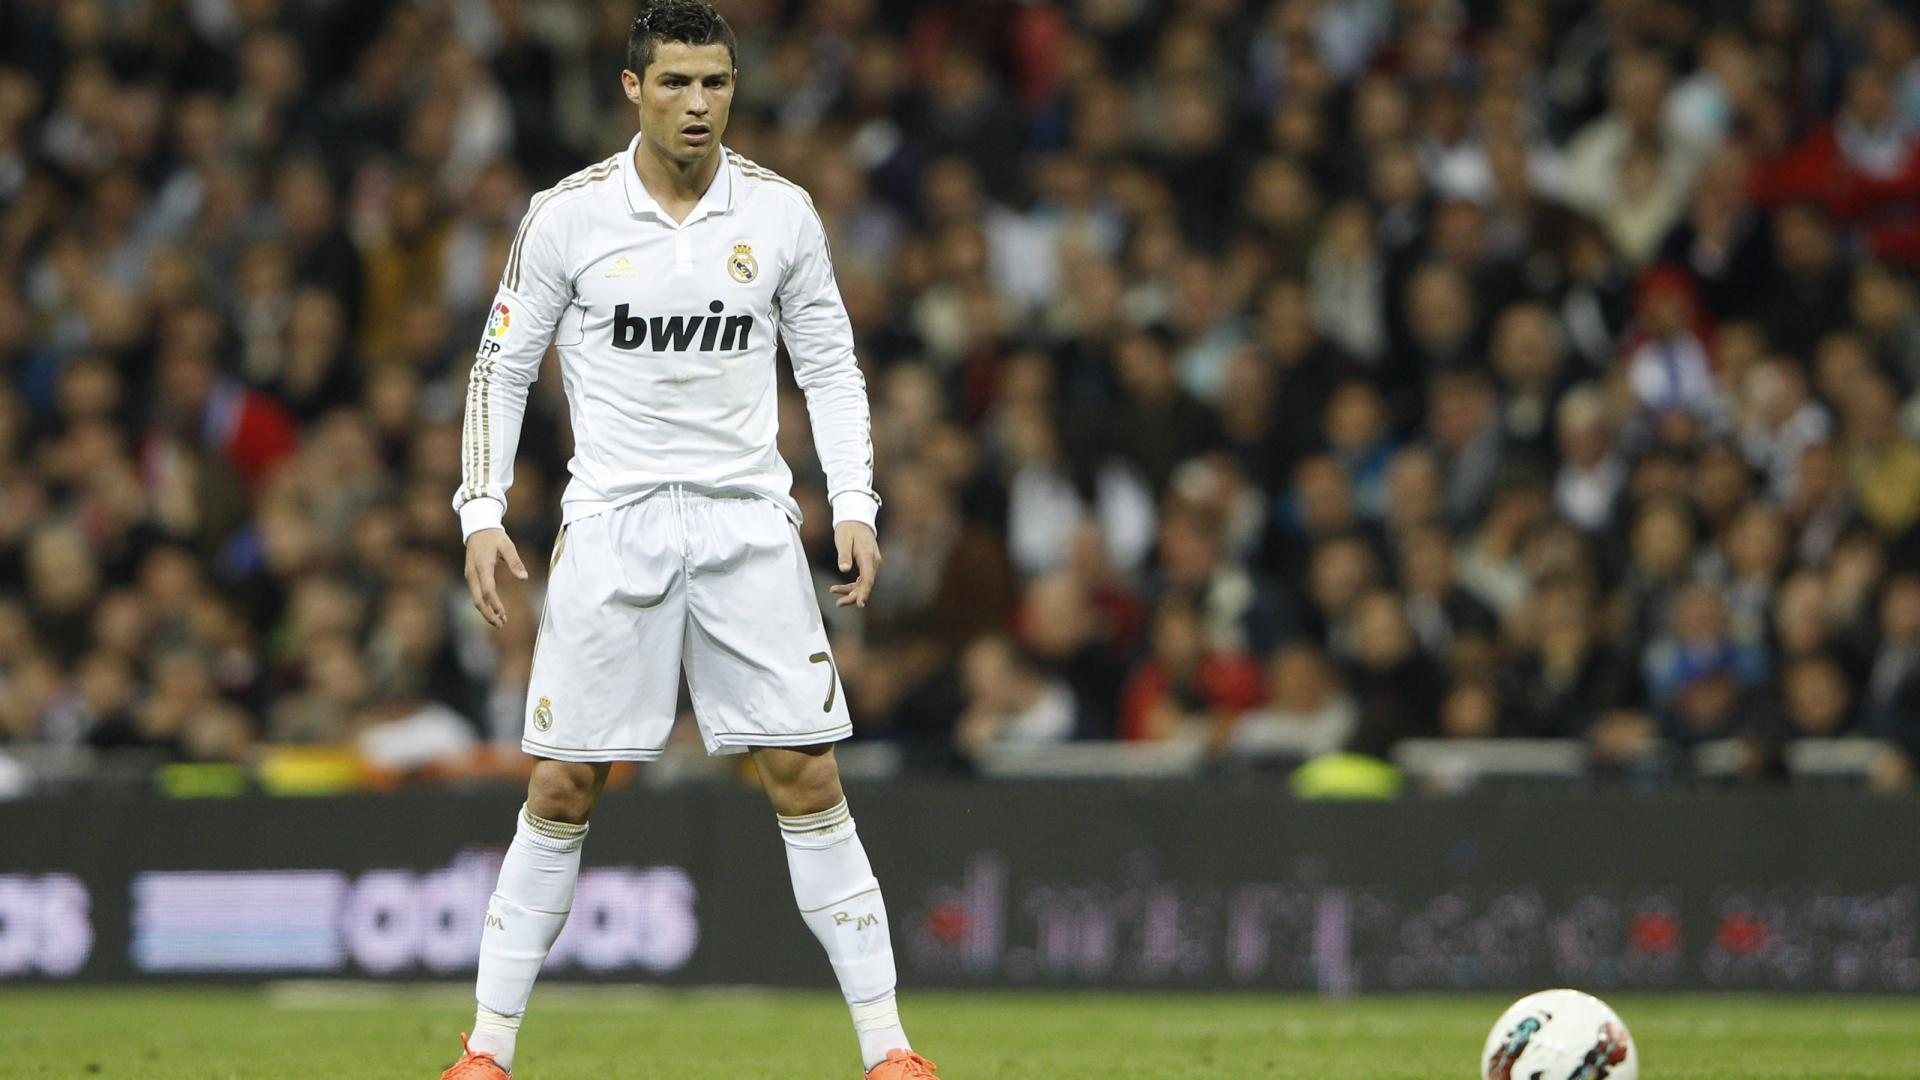 Hd wallpaper ronaldo - Cristiano Ronaldo Football Players Hd Wallpaper Of Football